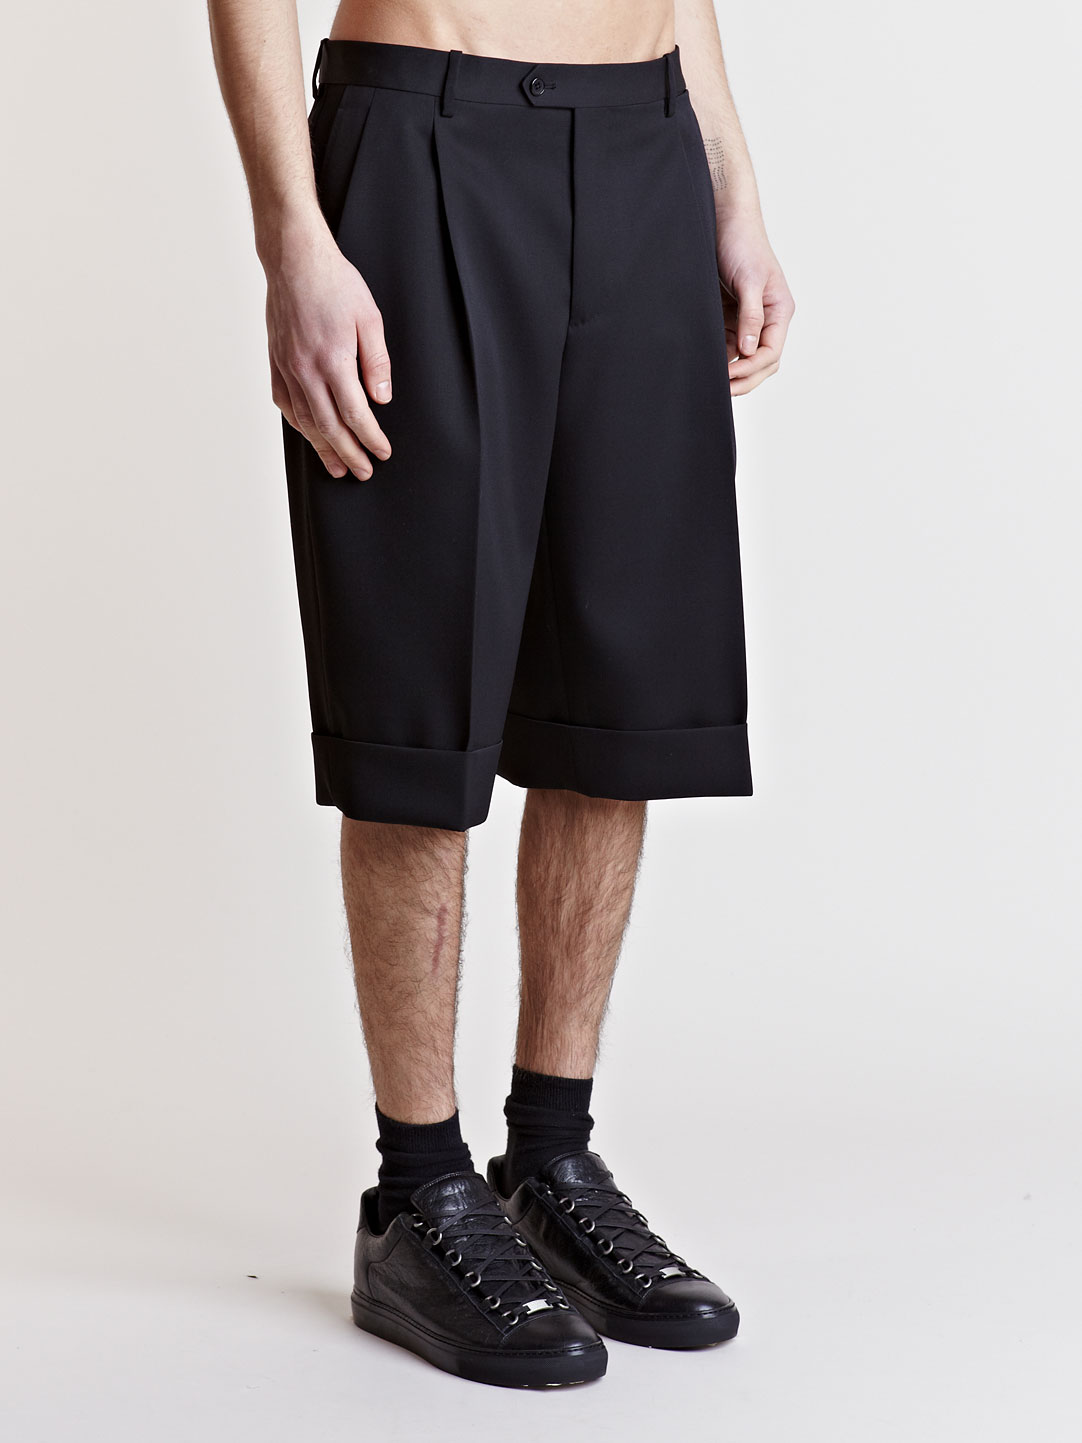 Balenciaga Tailored Shorts in Black for Men | Lyst